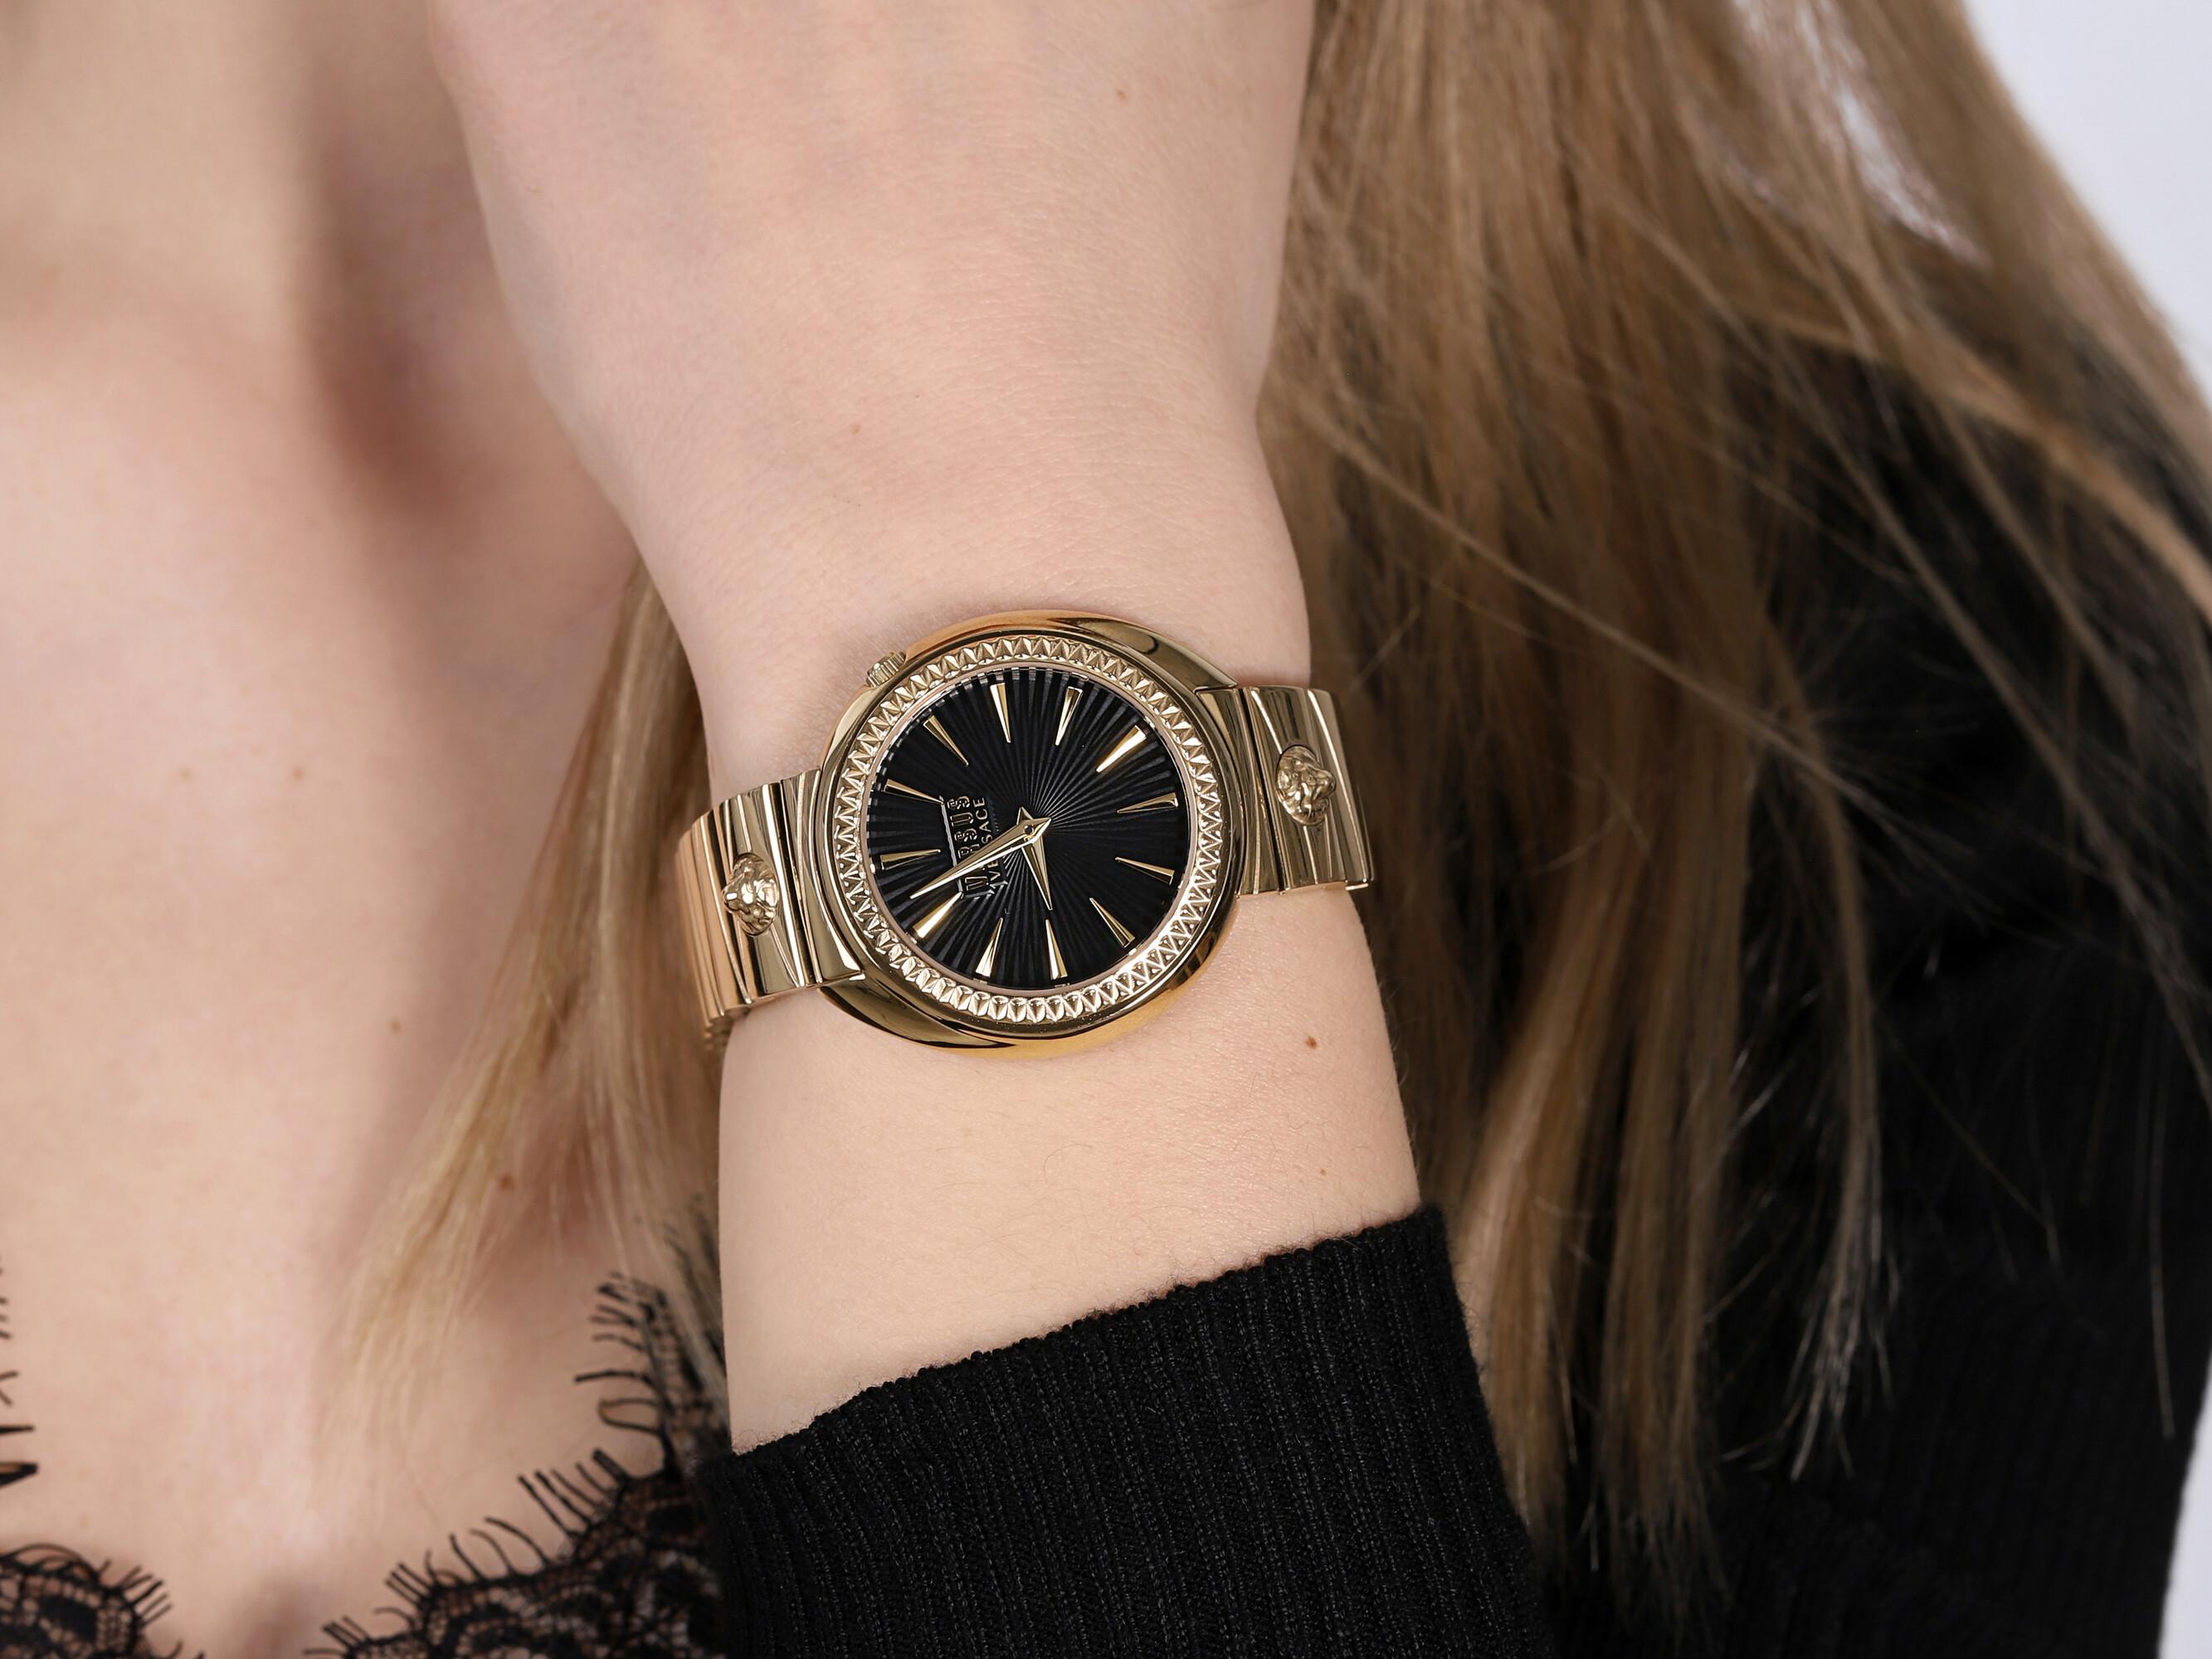 Versus Versace VSPHF1020 zegarek złoty klasyczny Damskie bransoleta